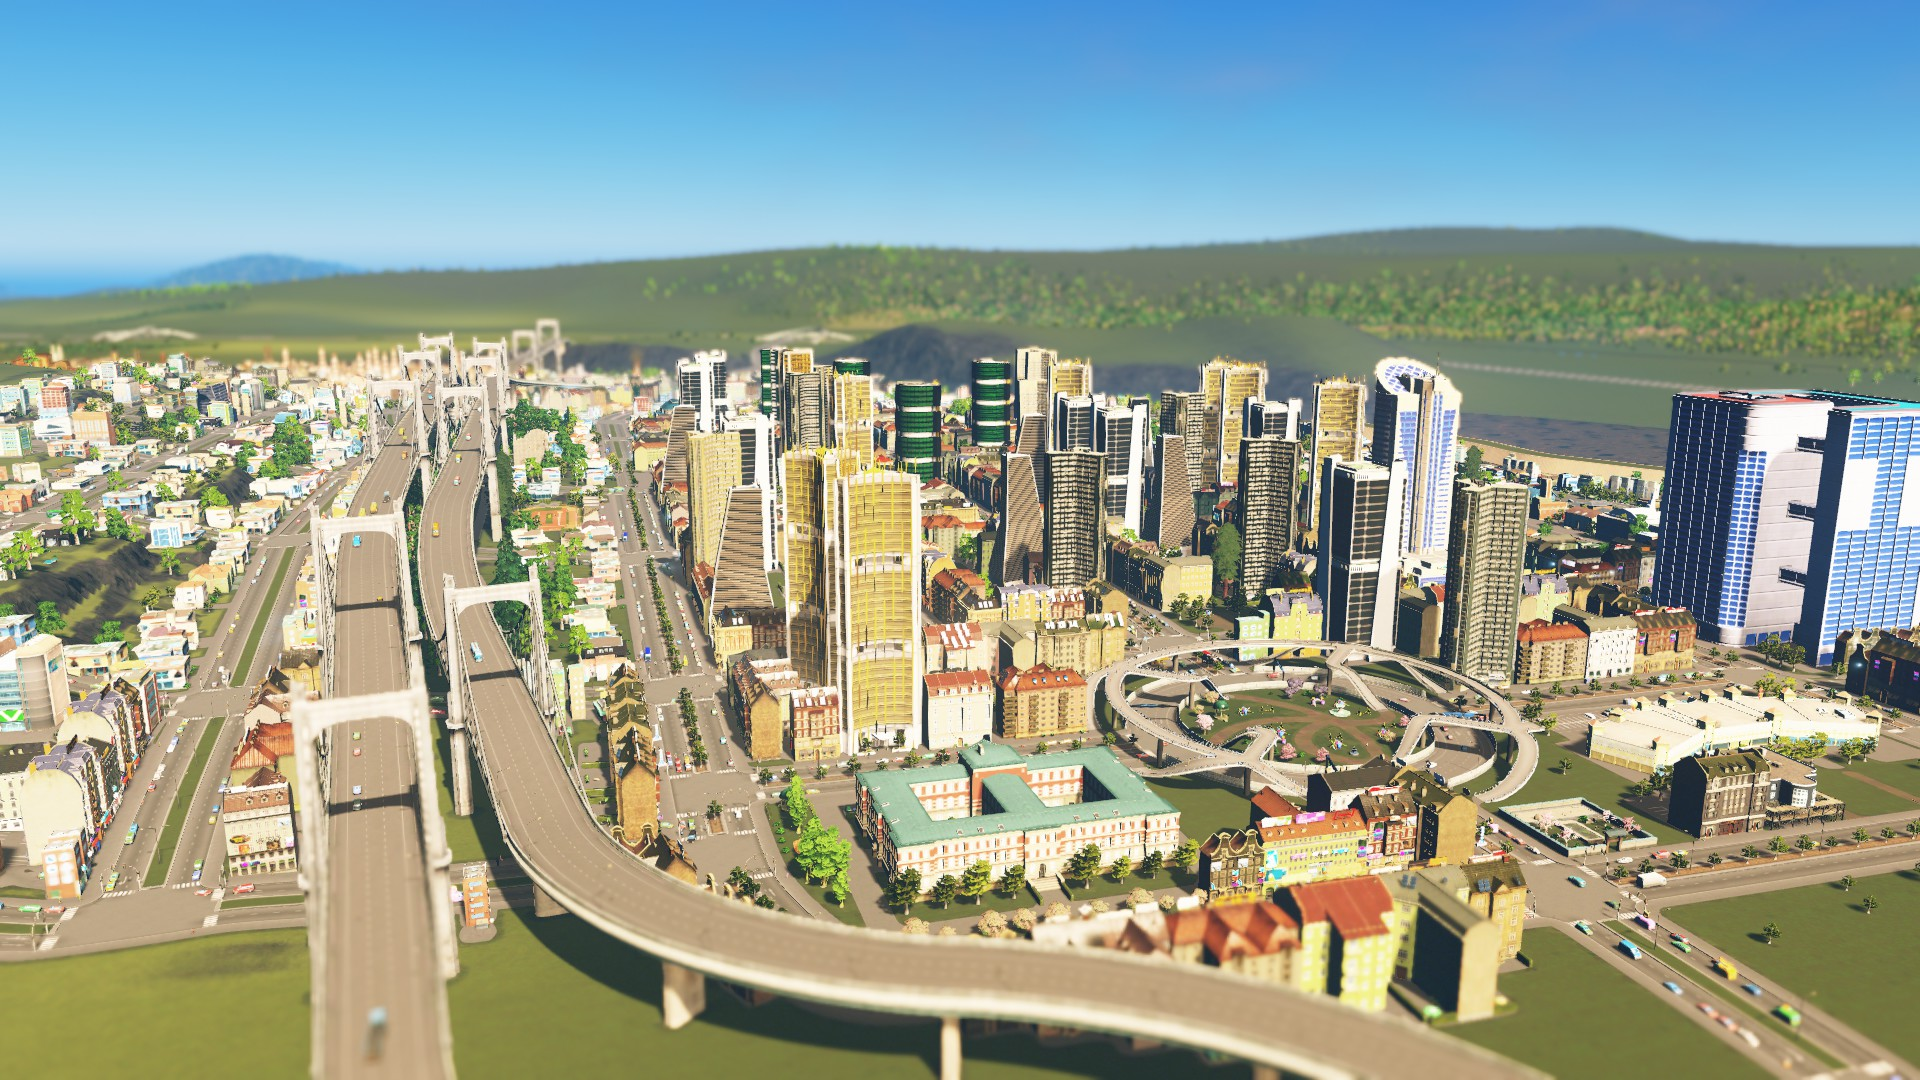 20171106222324_1.jpg - Cities: Skylines